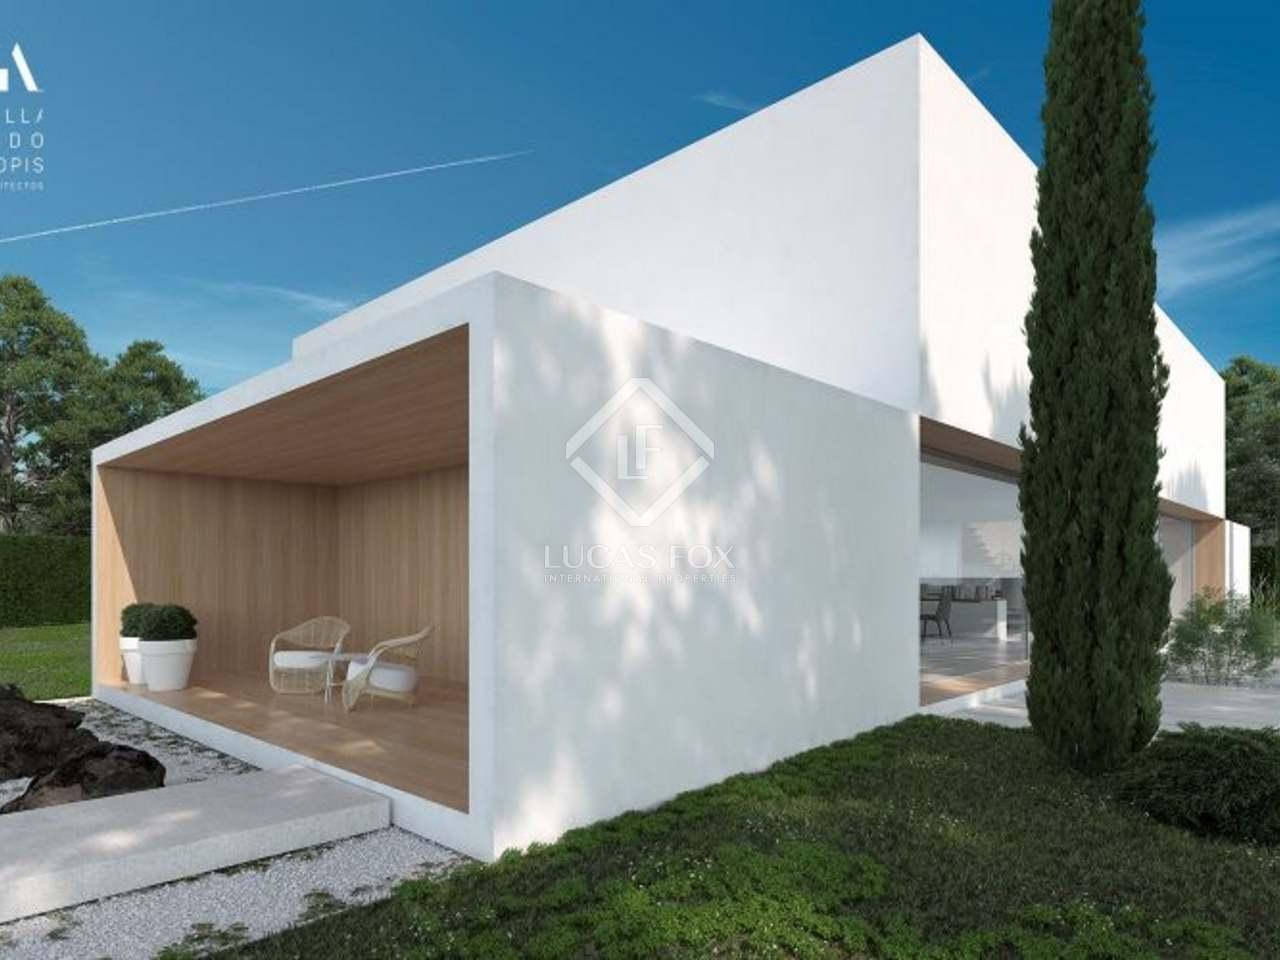 Chalet moderno de obra nueva con piscina en venta en rocafort for Proyecto chalet moderno